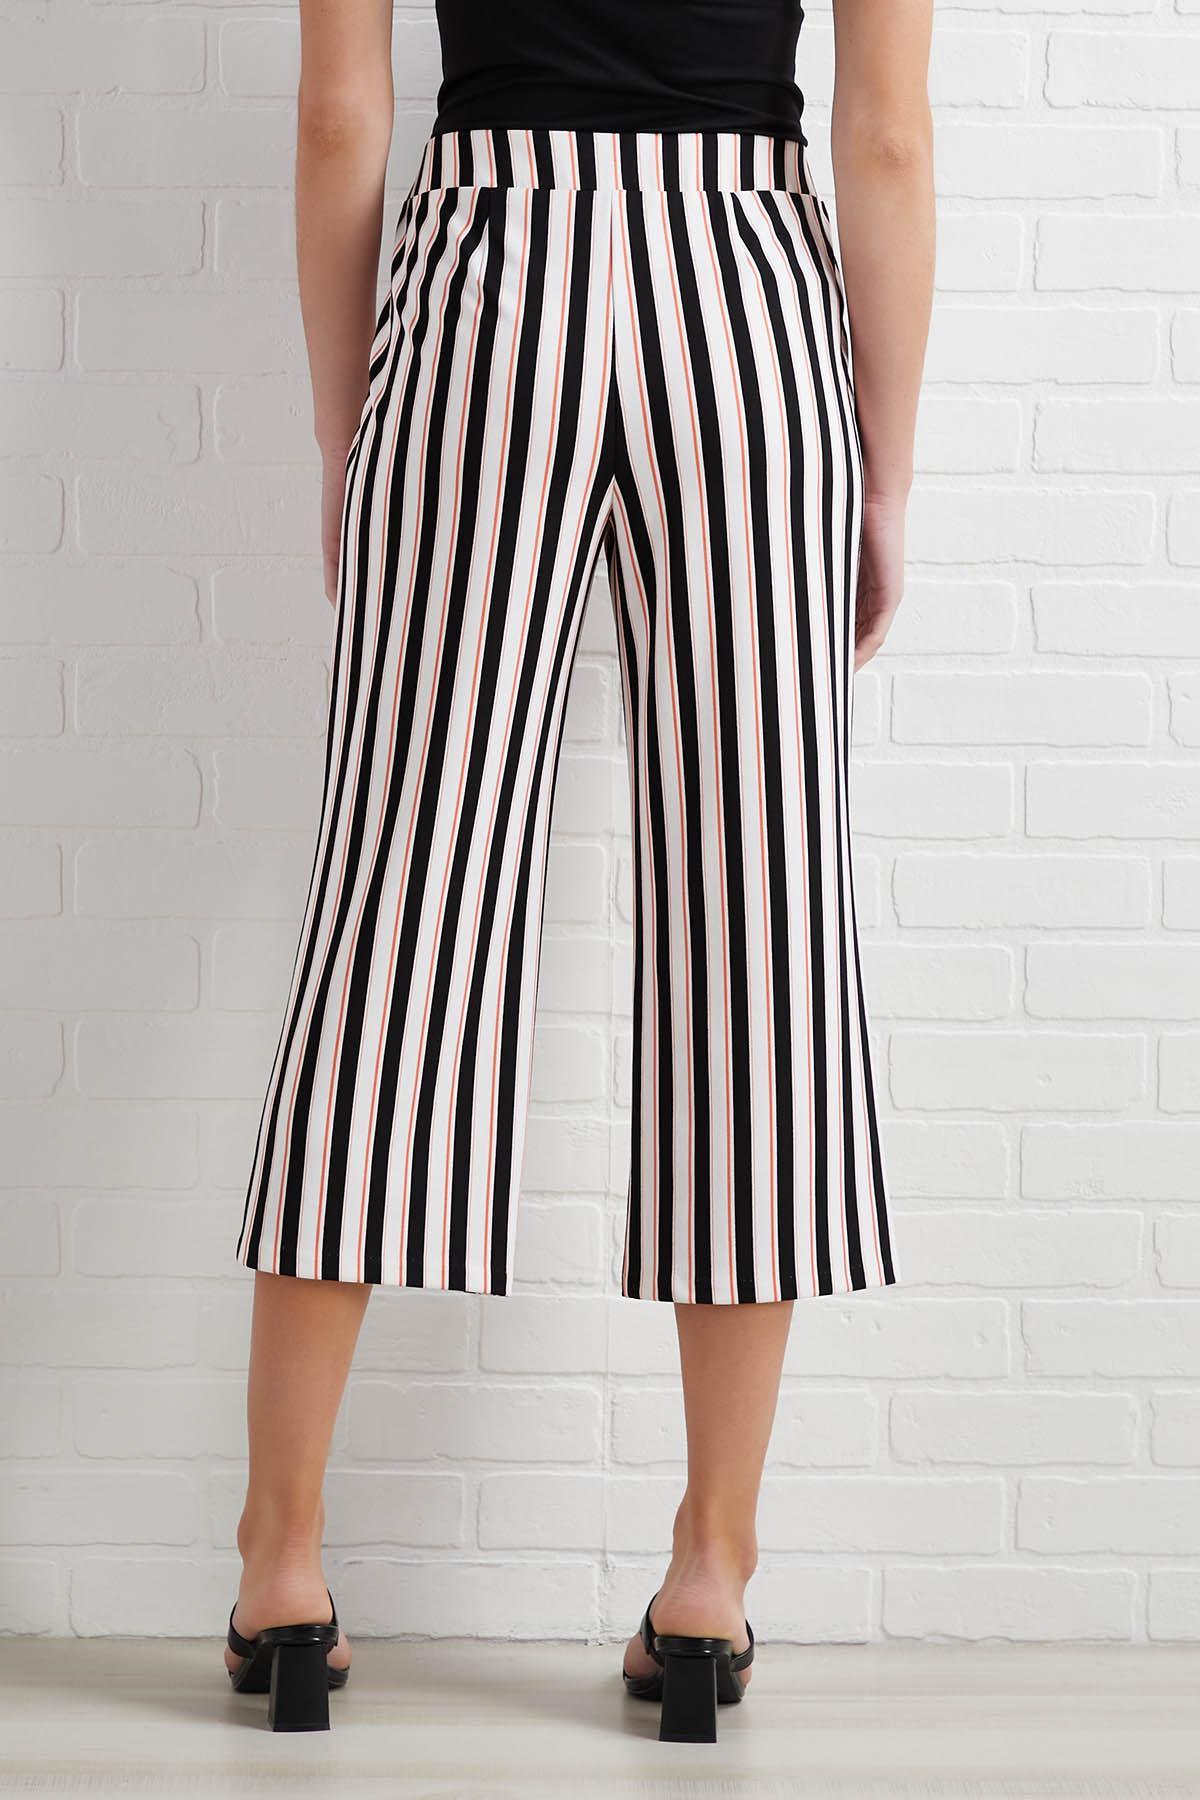 Summer Fridays Pants